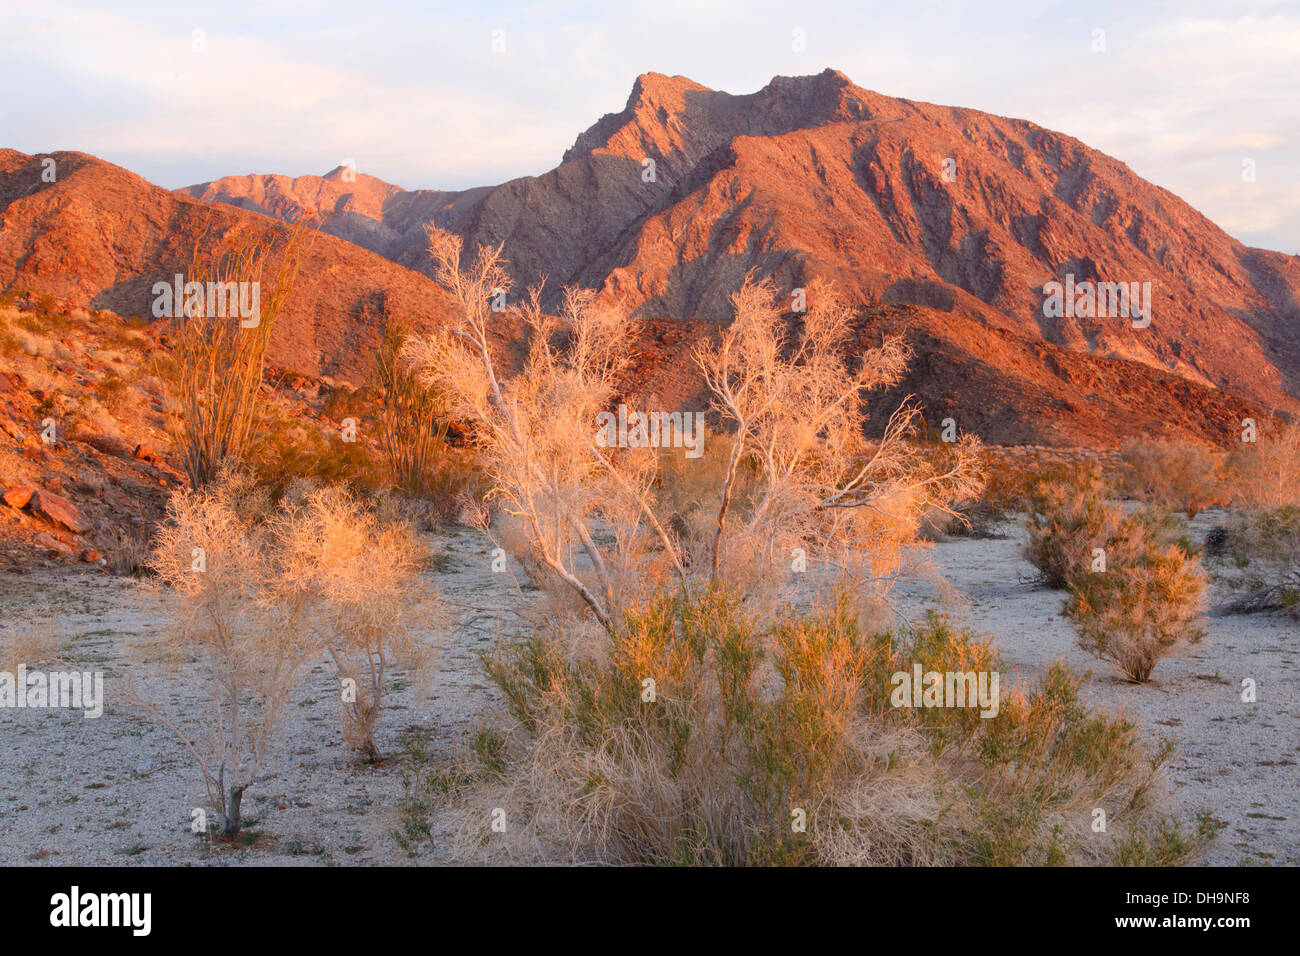 Anza-Borrego Desert State Park, California. - Stock Image